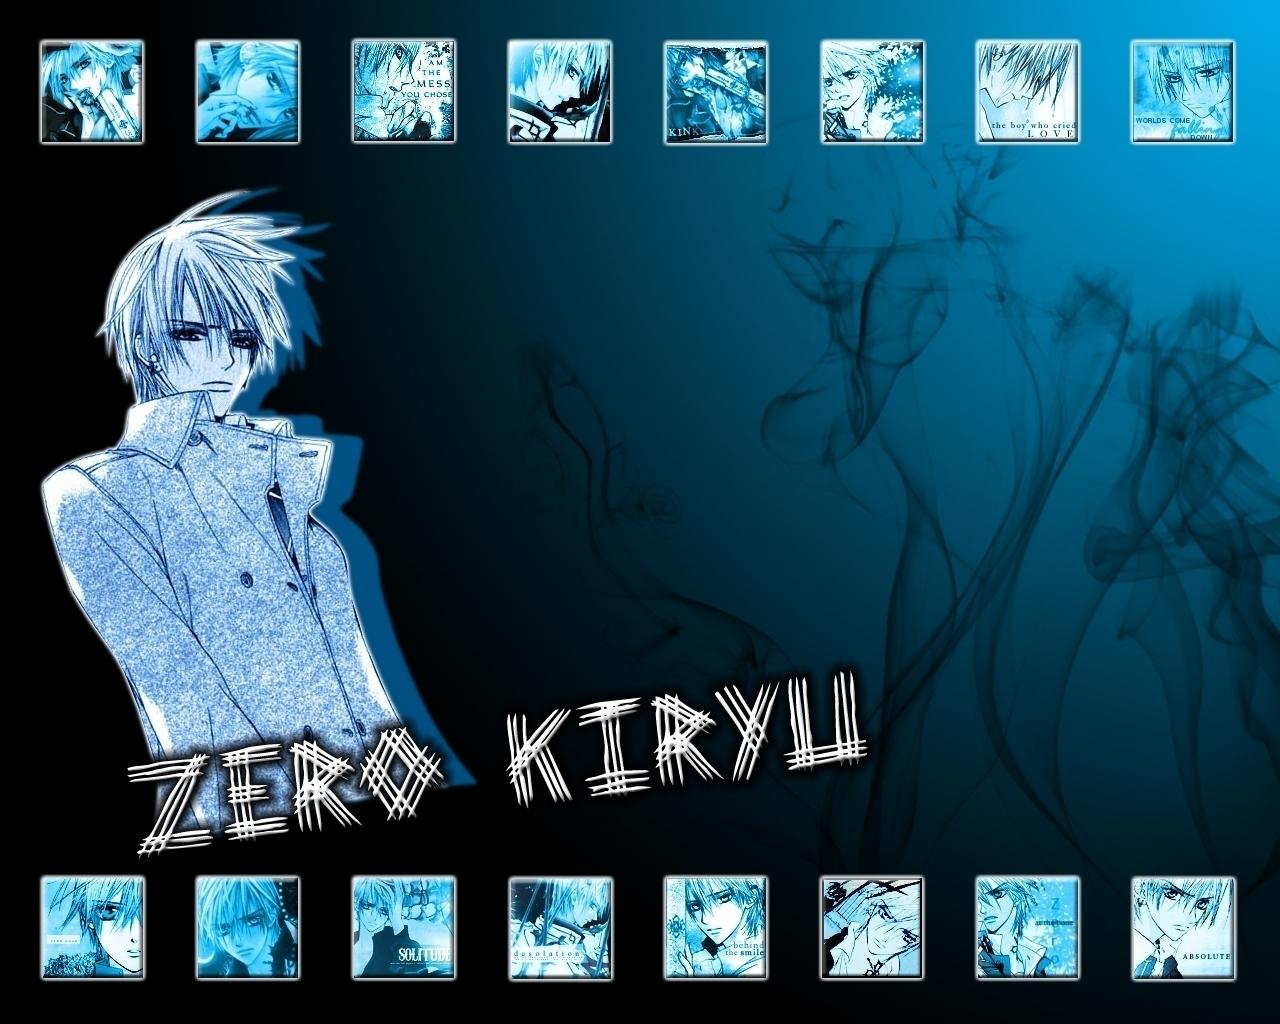 Zero Kiryu - Vampire Knight Wallpaper (14240779) - Fanpop